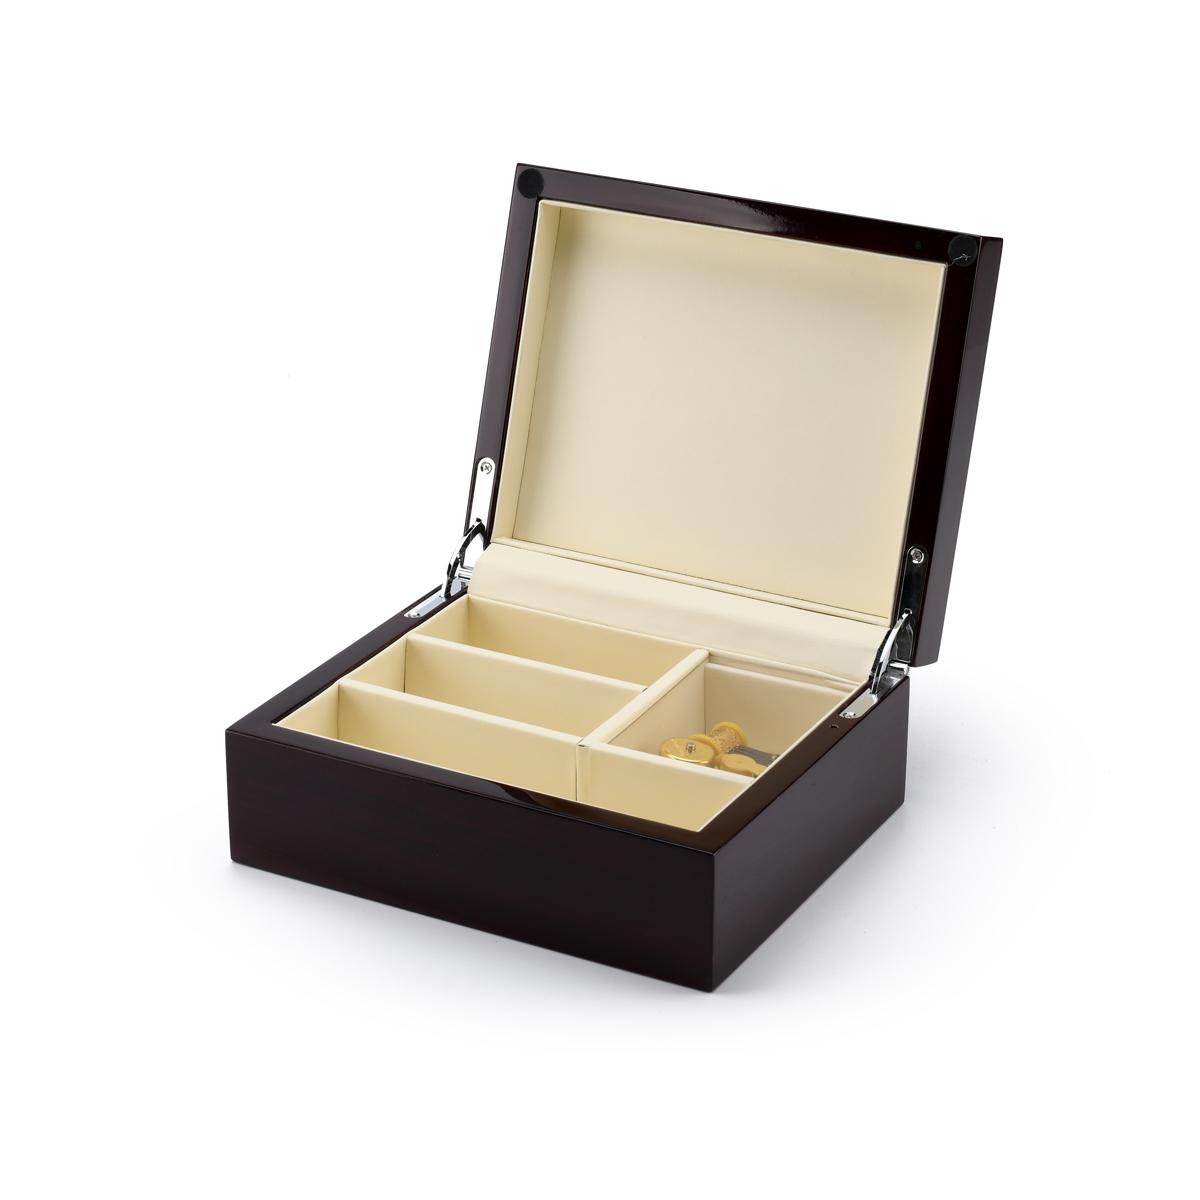 Contemporary 18 Note Hi Gloss Walnut Finish 5 LCD Video Jewelry Box